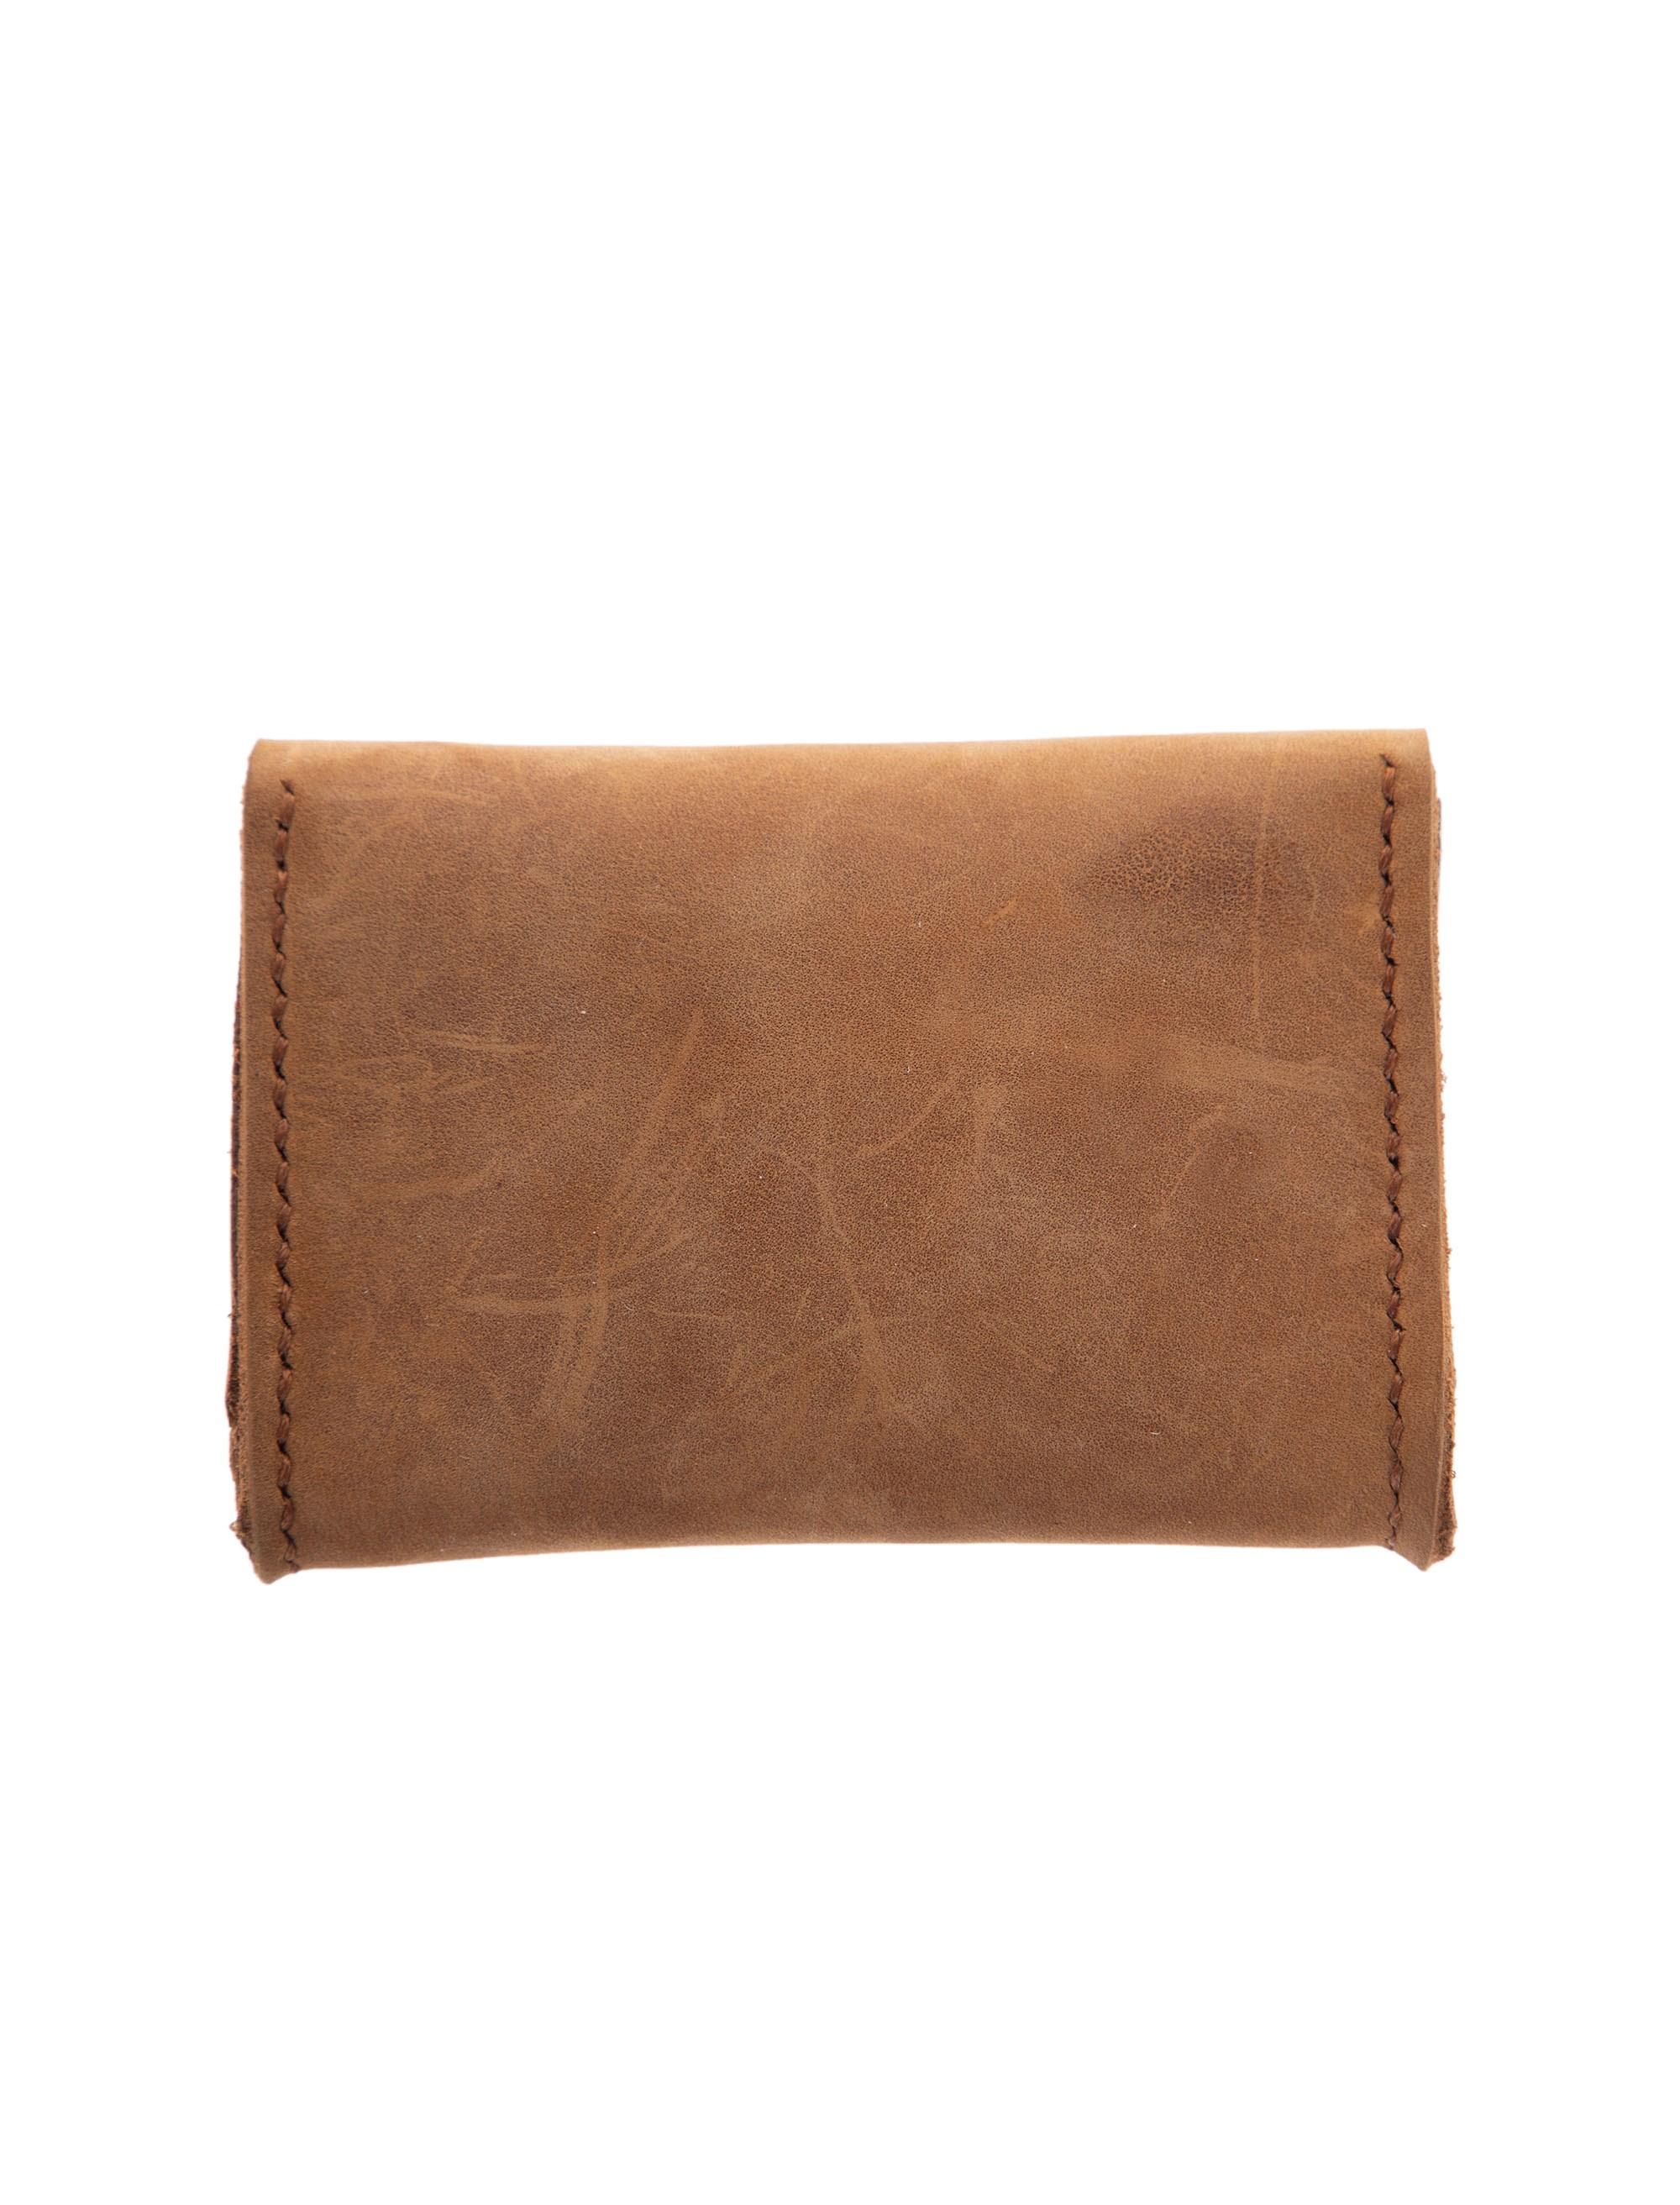 کیف کارت اعتباری چرم بزرگسال - چرم لانکا